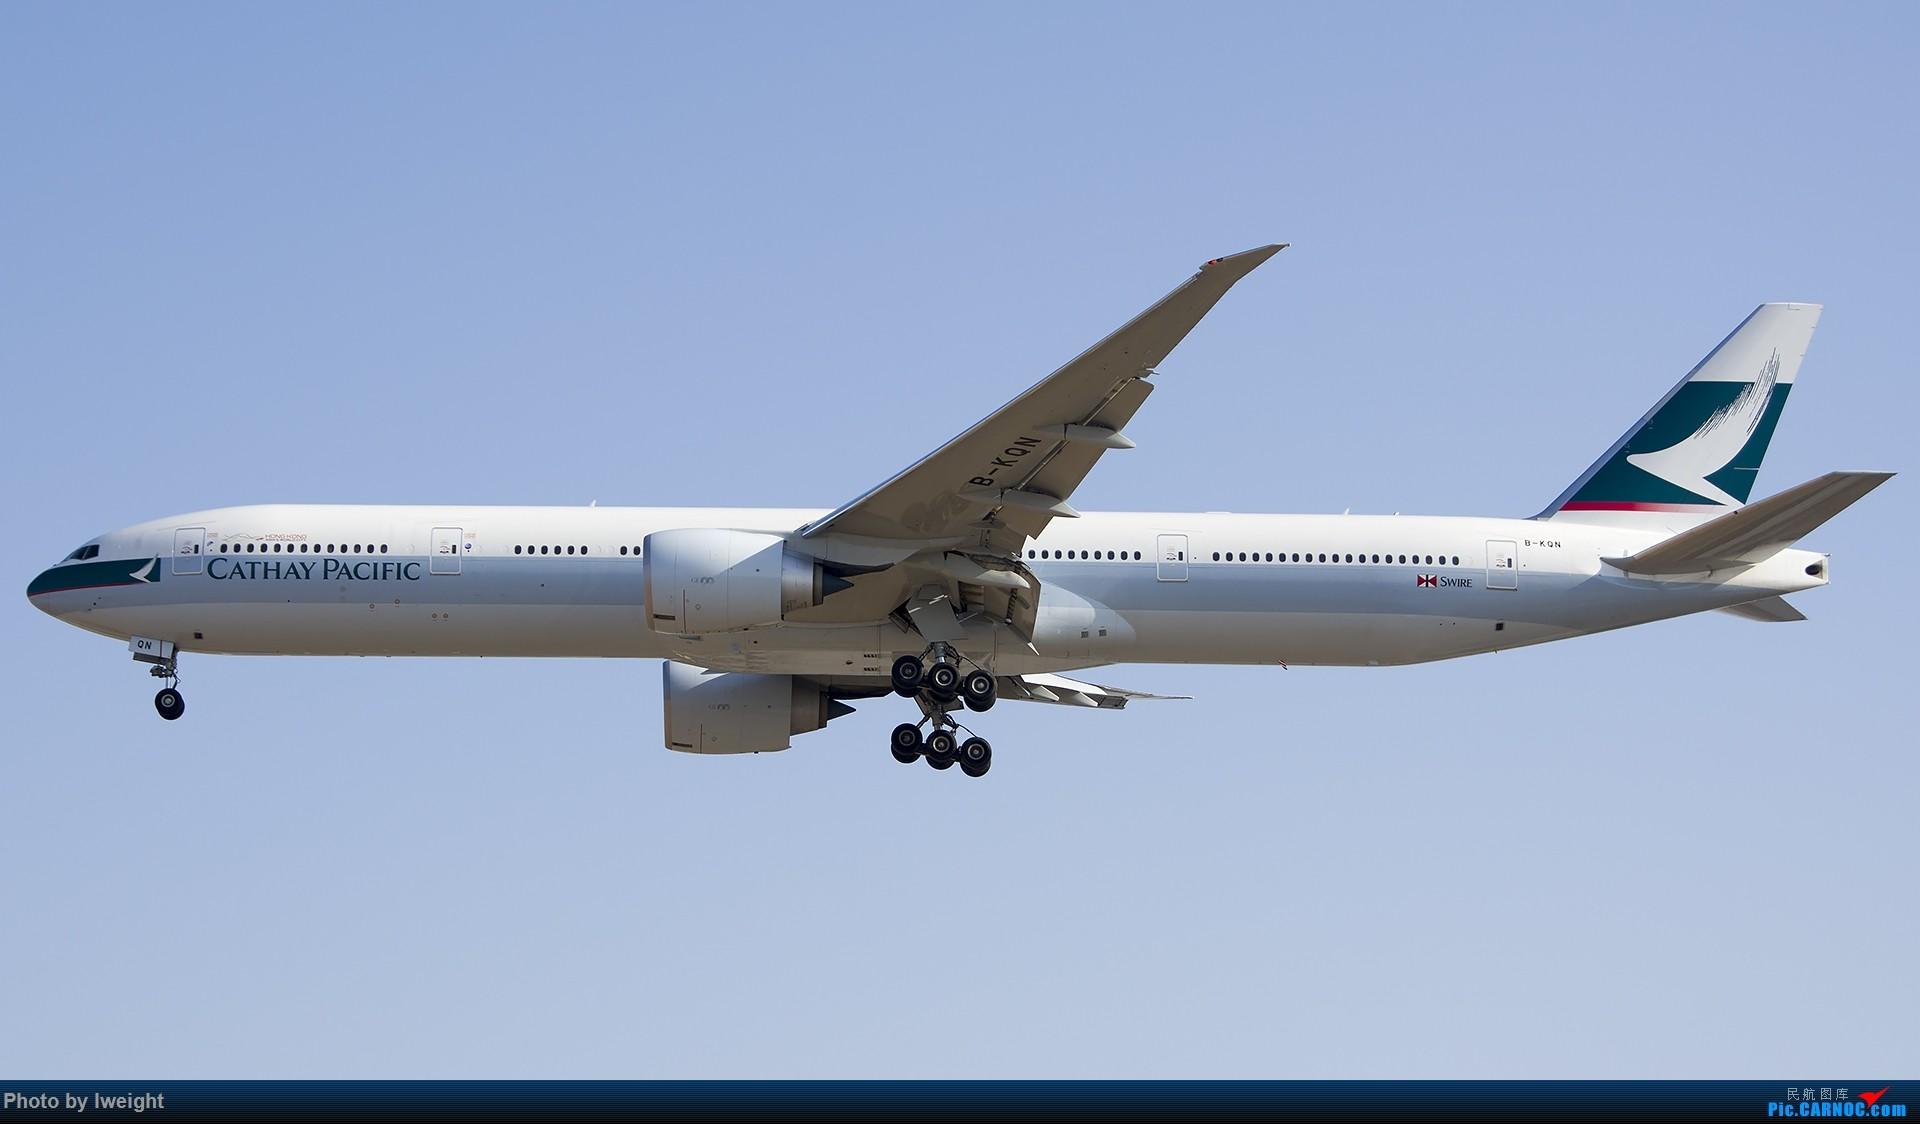 Re:[原创]庆祝升级777,发上今天在首都机场拍的所有飞机【2014-12-14】 BOEING 777-300ER B-KQN 中国北京首都国际机场